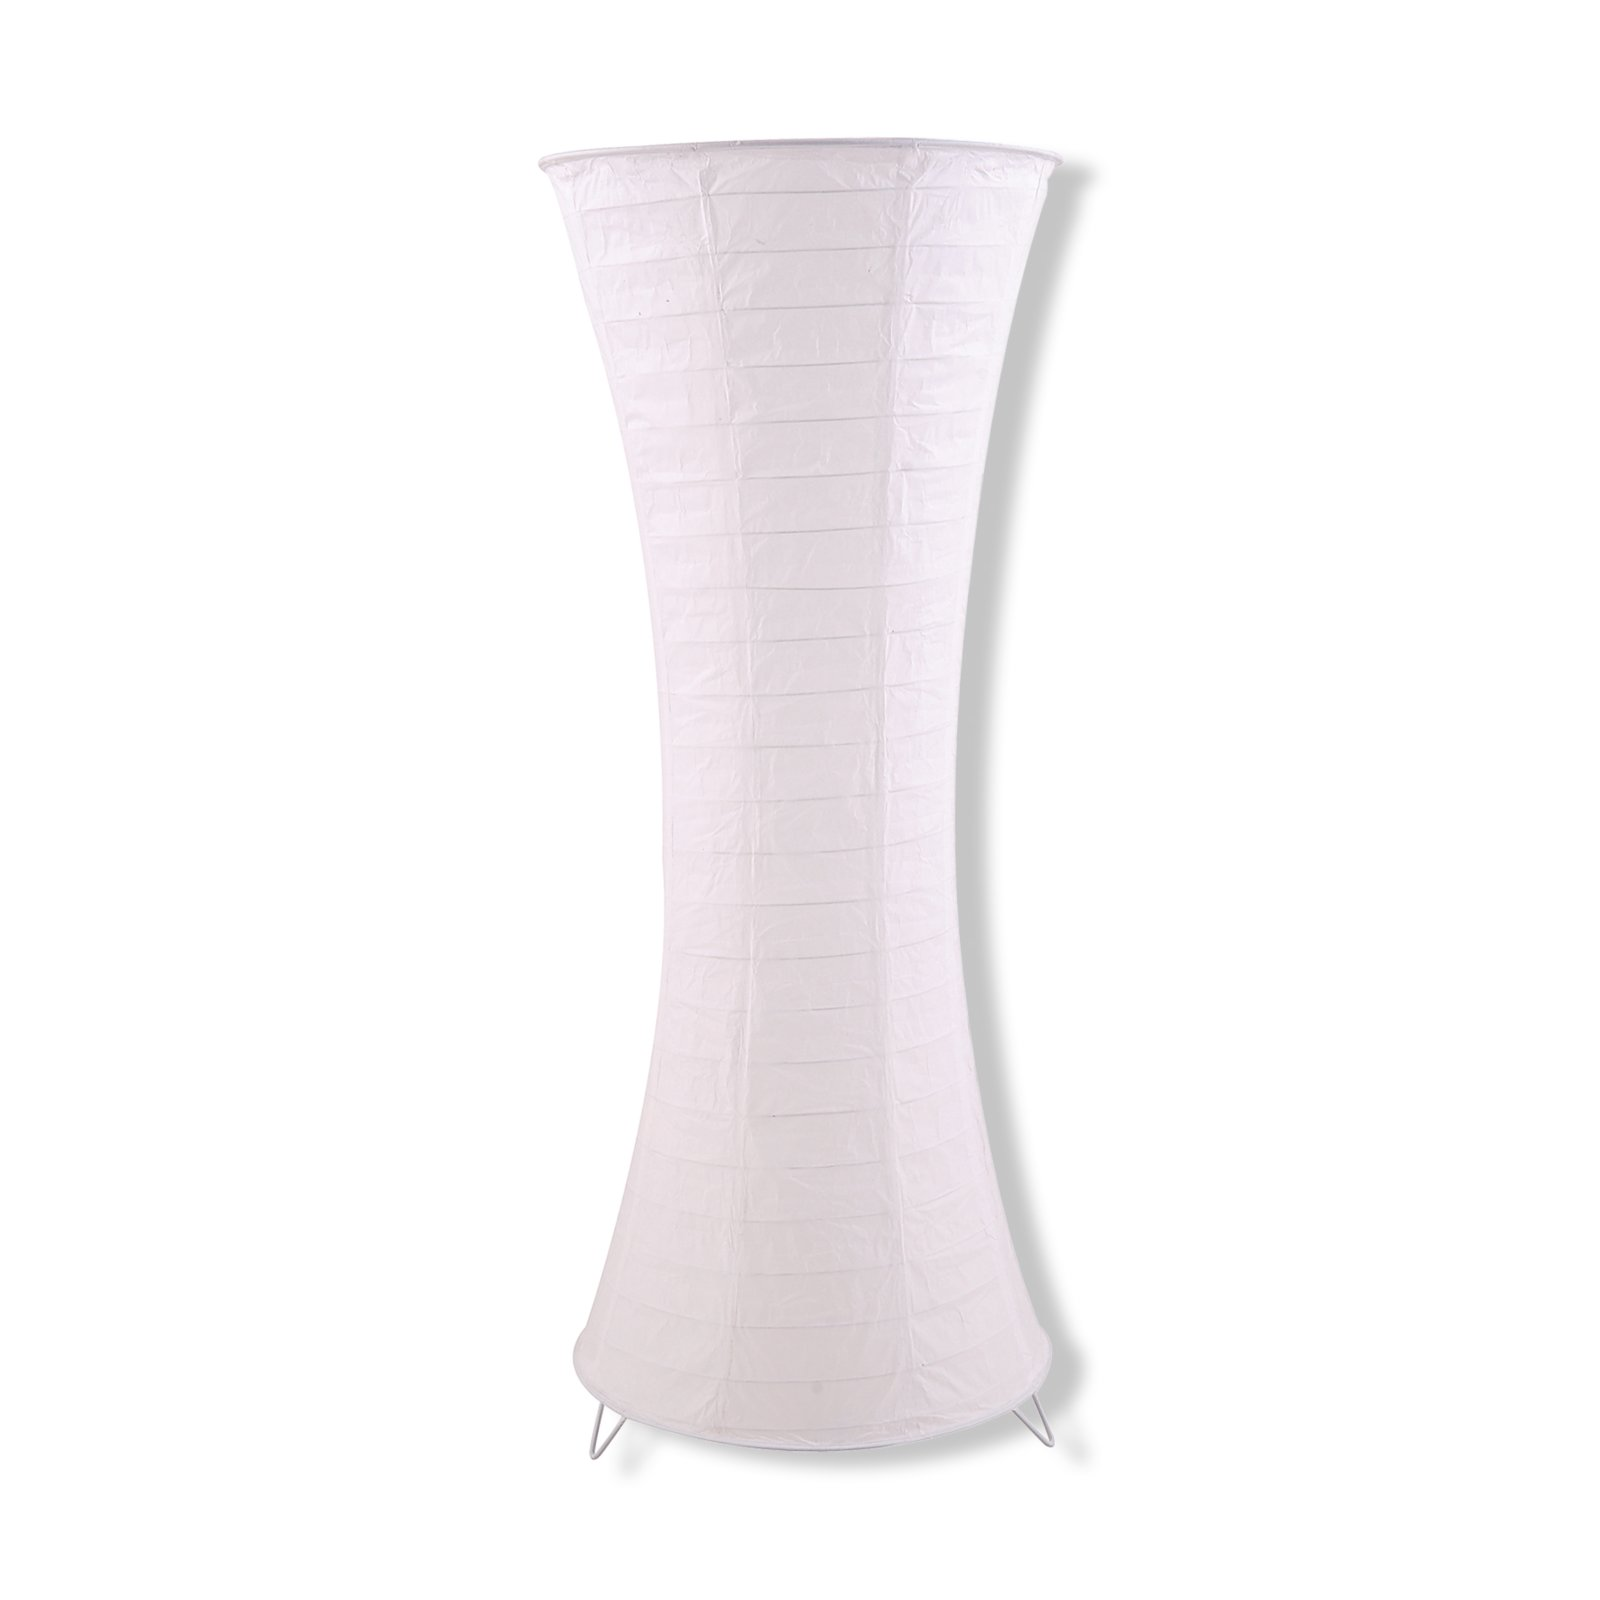 roller stehlampe wei papierschirm metallgestell ebay. Black Bedroom Furniture Sets. Home Design Ideas